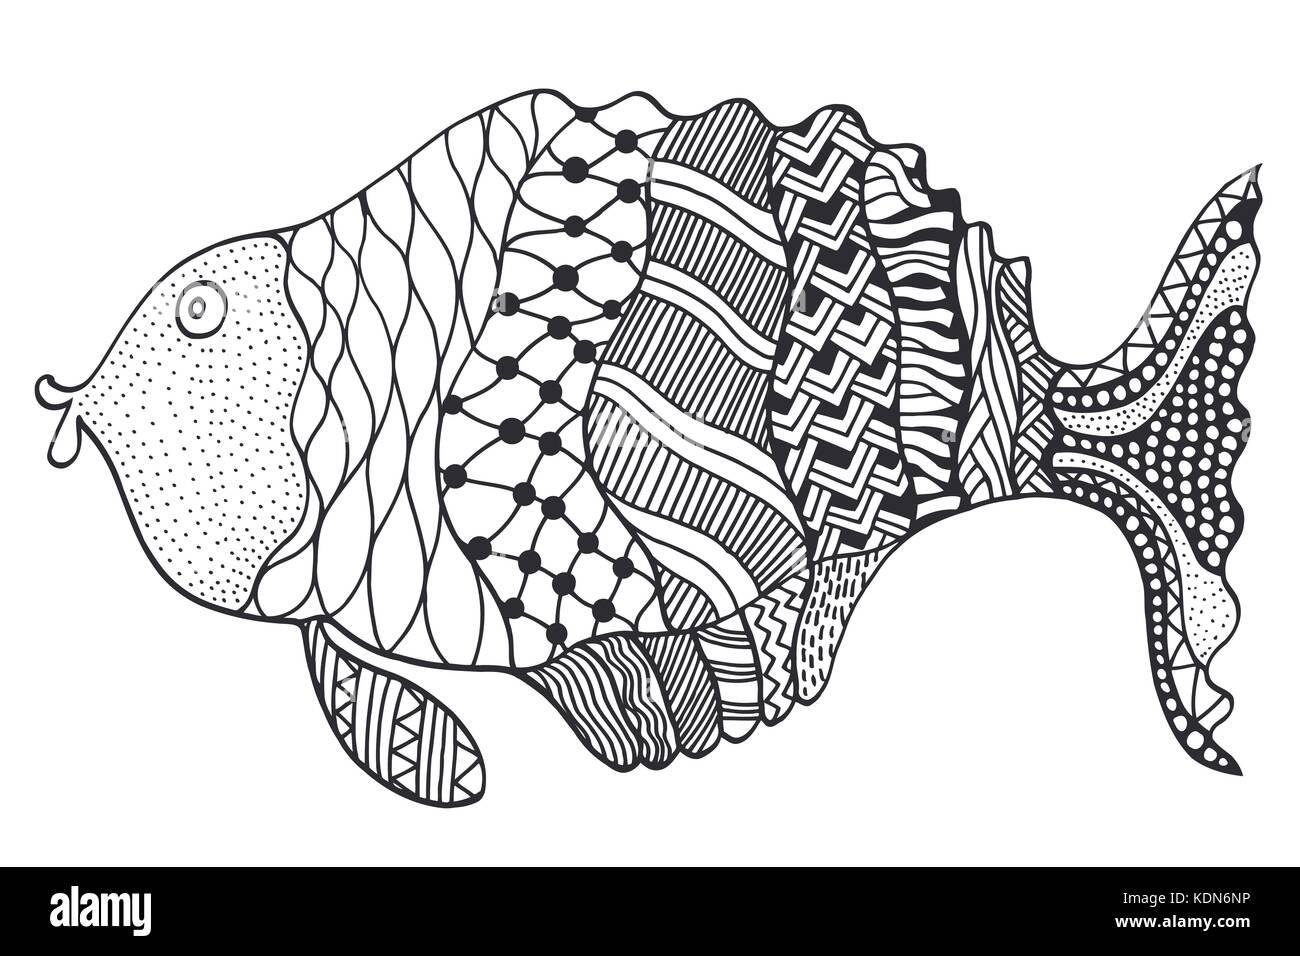 - Vector Hand Drawn Doodle Outline Fish Illustration. Decorative